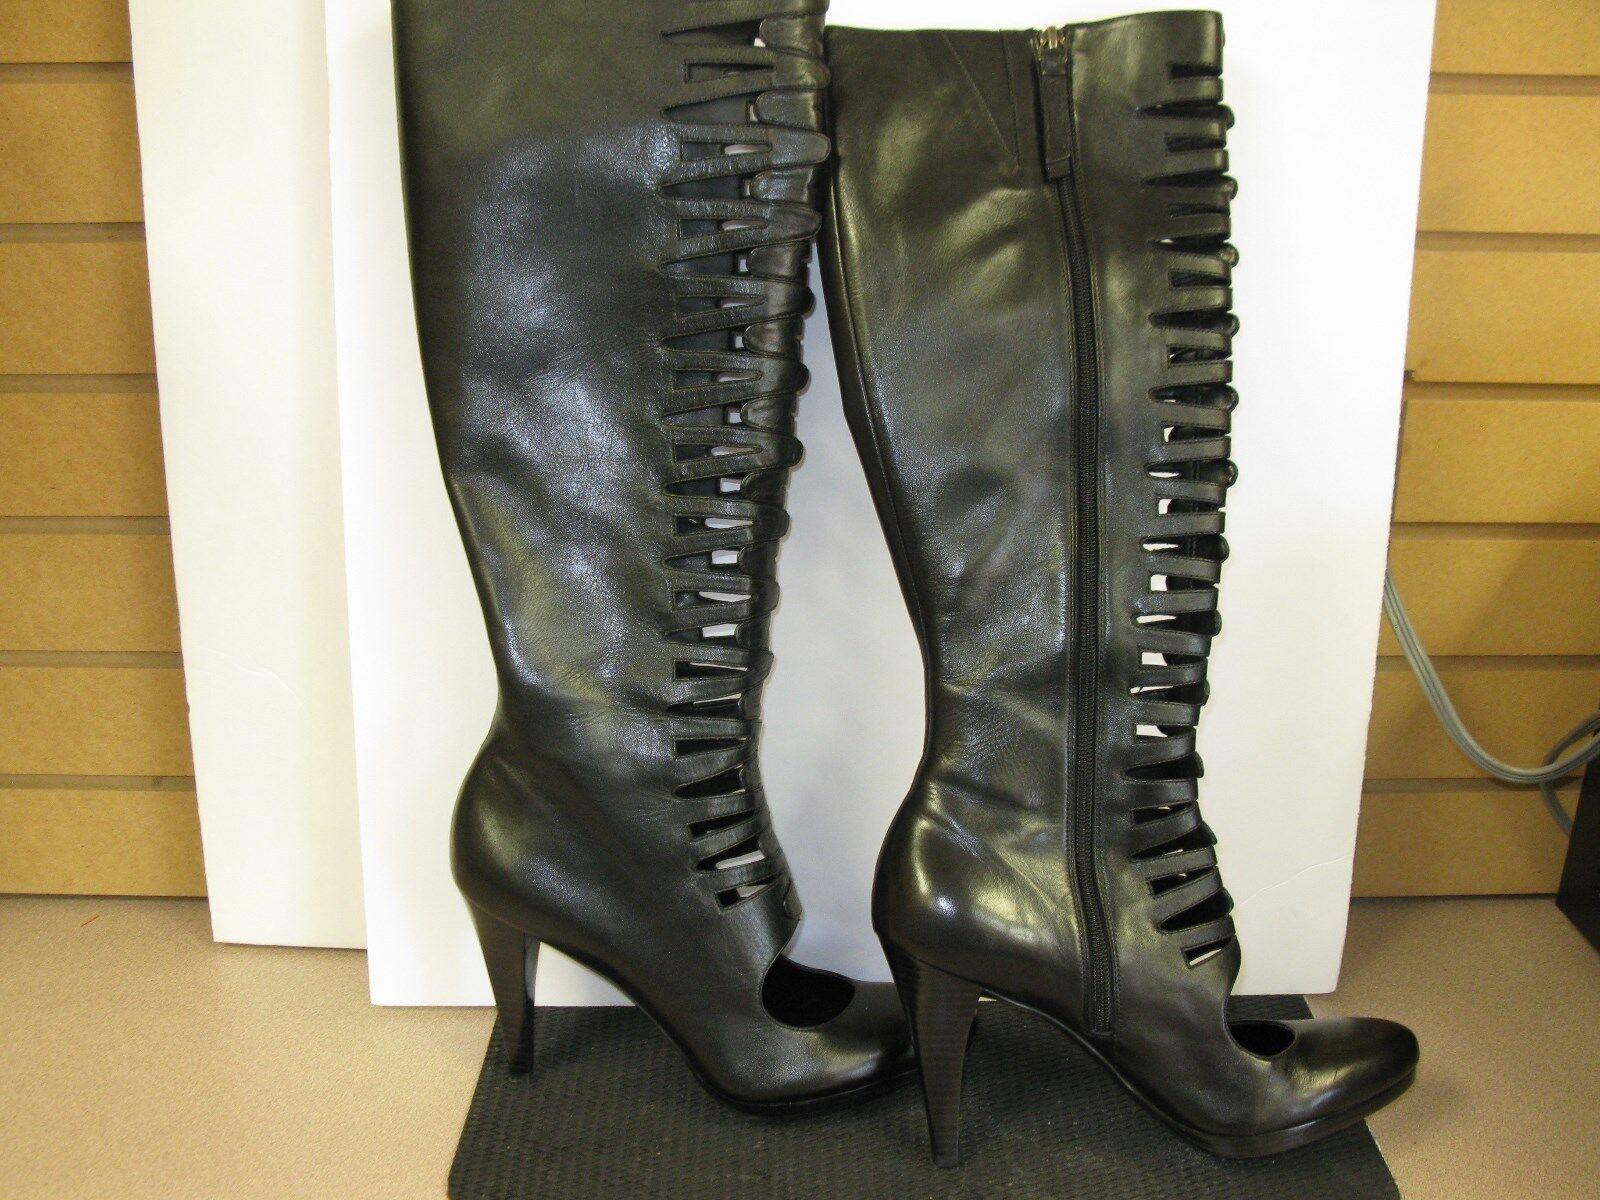 Tahari Lawton Black 100% Leather Knee High Lace Up Boots Boots Boots High Heel Sz10M de1d4b